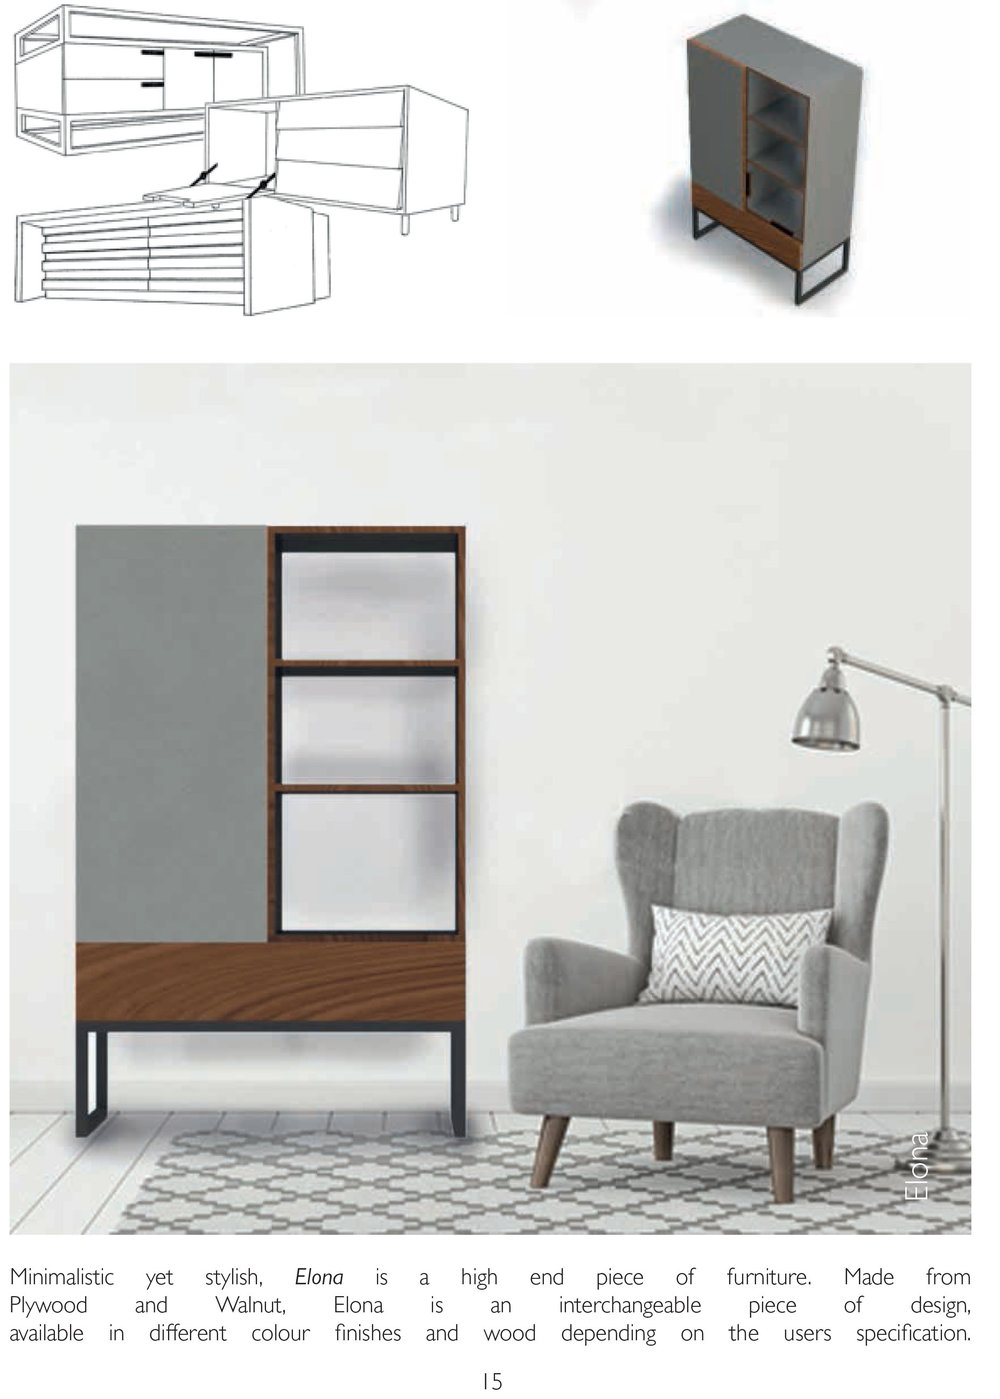 Furniture Product Design   Brochure   NTU Degree Show 2017 17 jpg. BA Furniture   Product Design Brochure 2017   NTU Design Industries